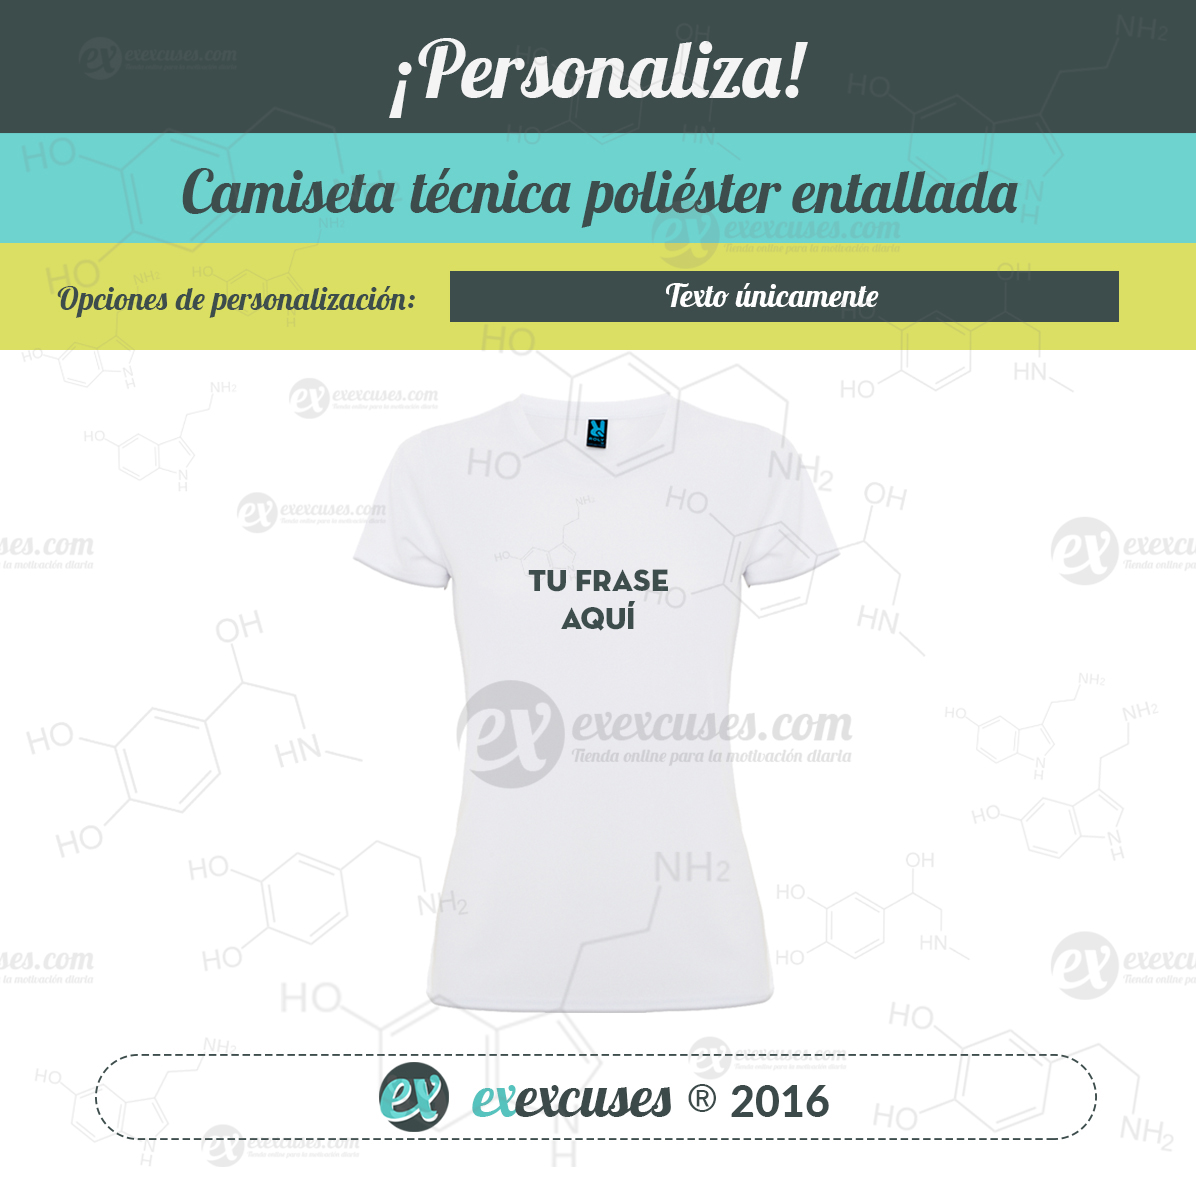 Camiseta poliéster entallada exexcuses®